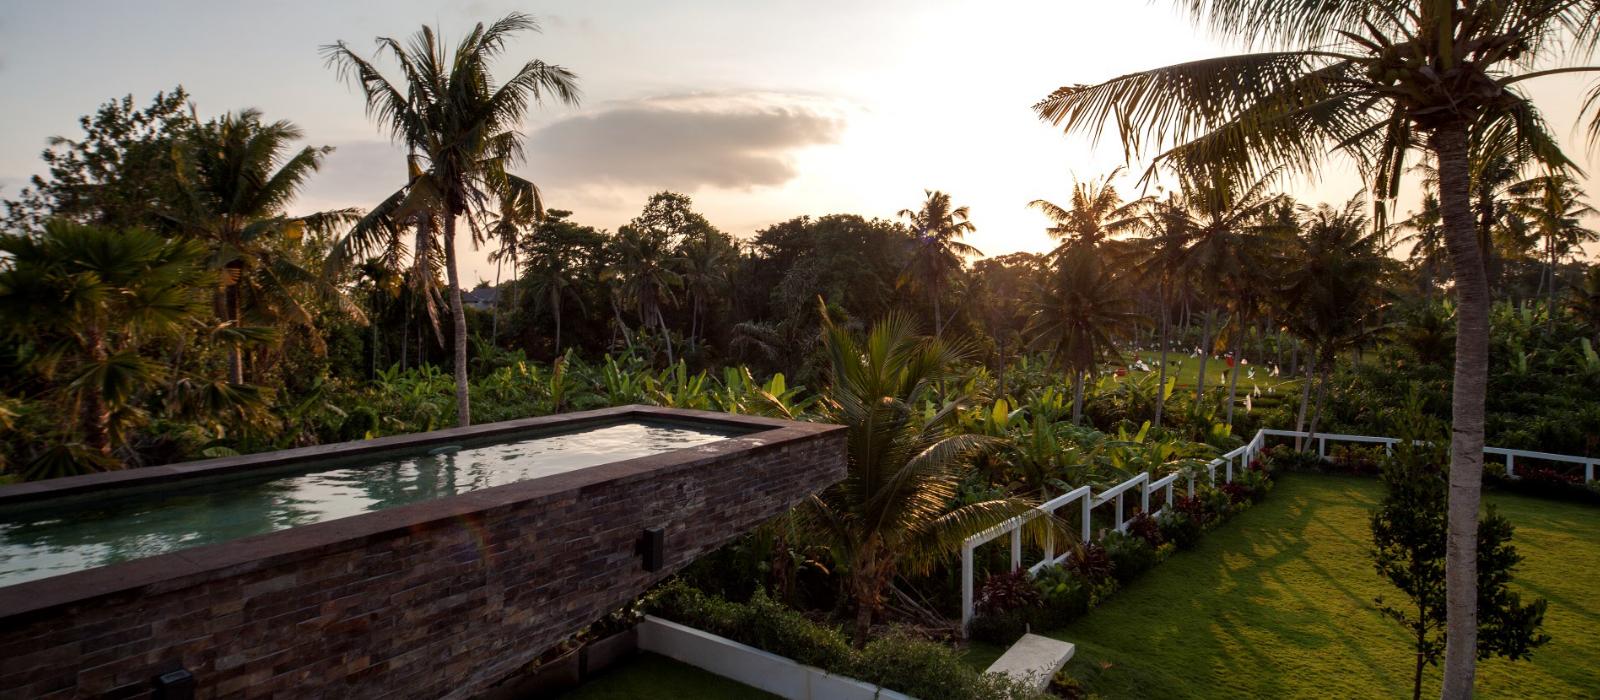 Villa suami luxury villa canggu pool hanging